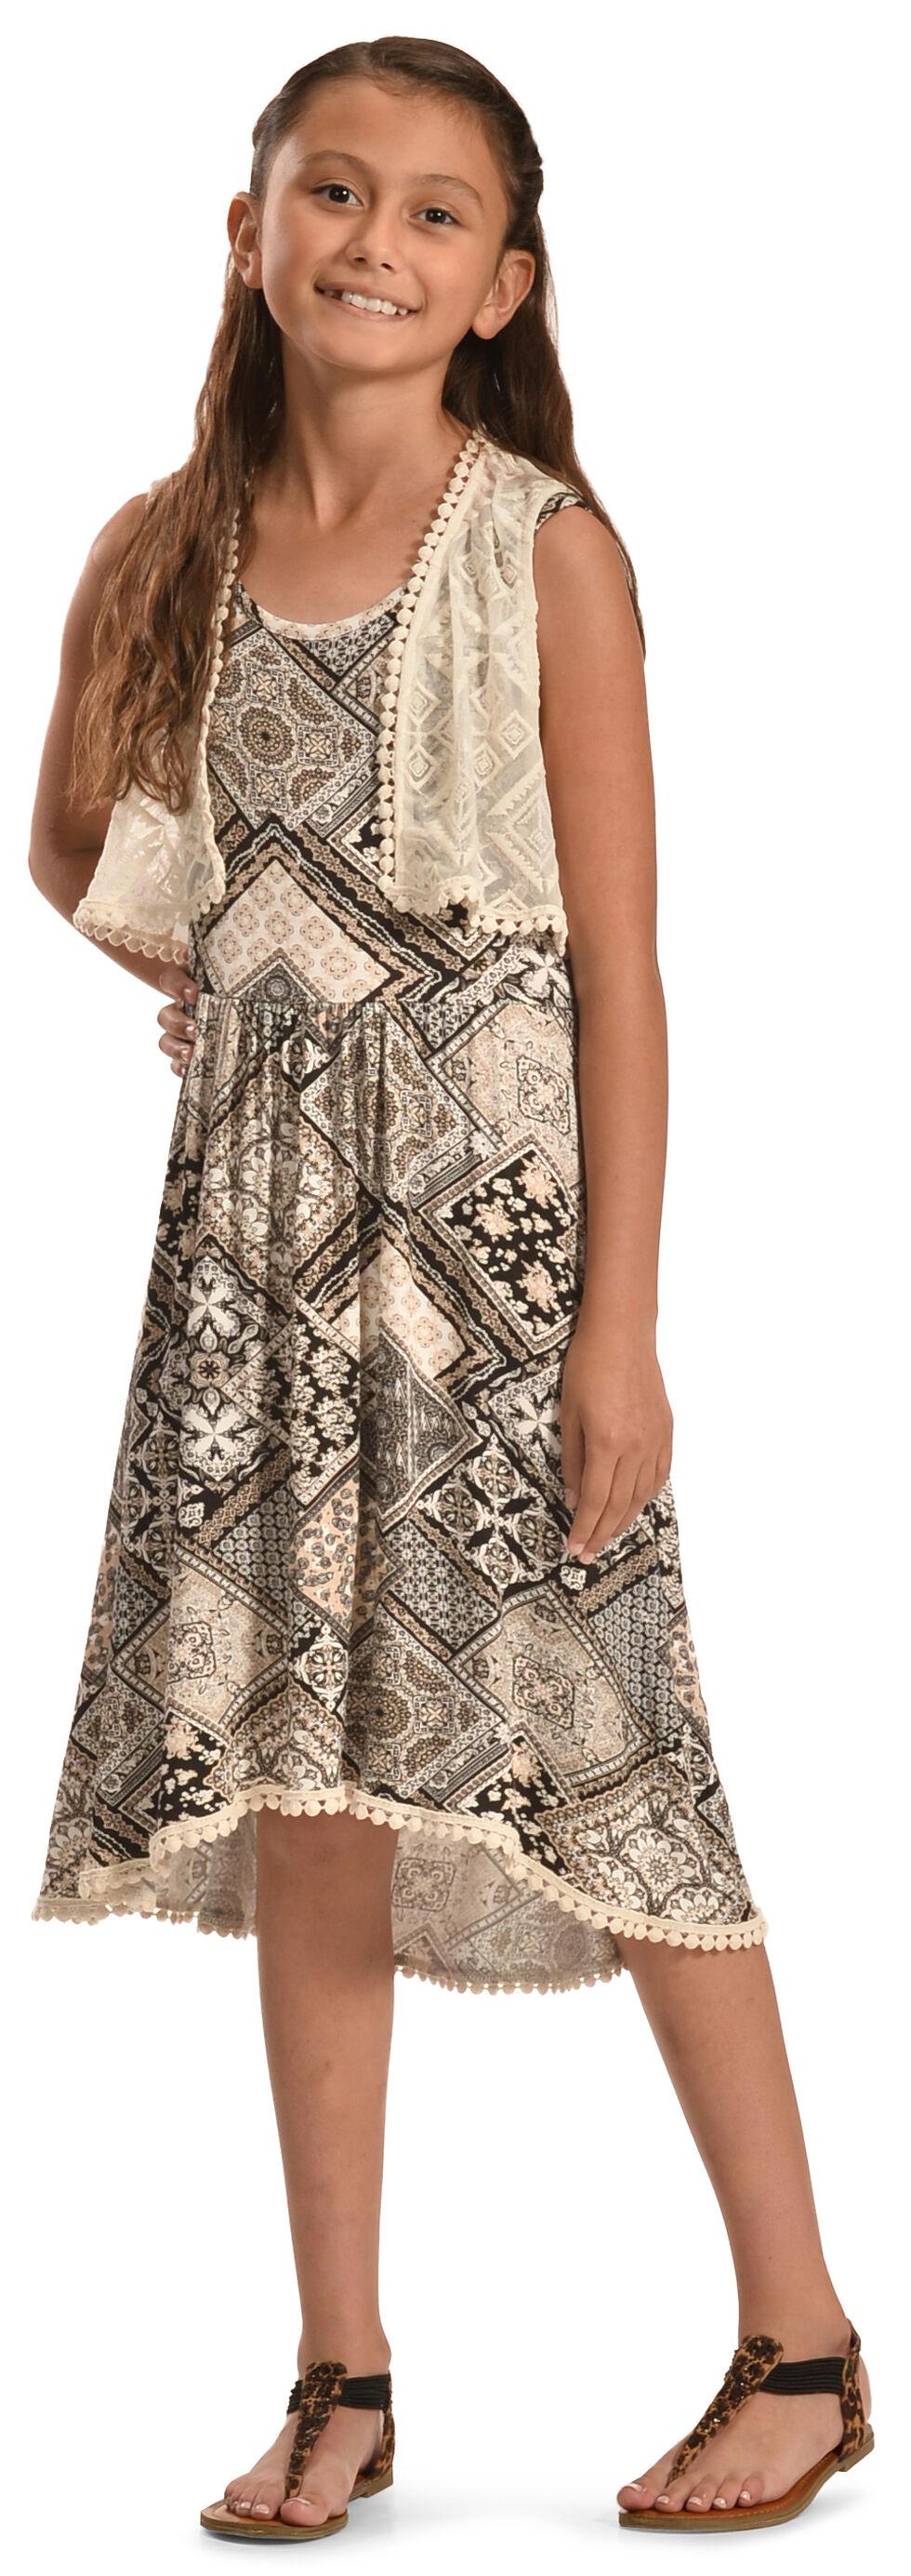 Jody of California Girls' Black Aztec Print Lace Dress , Black, hi-res